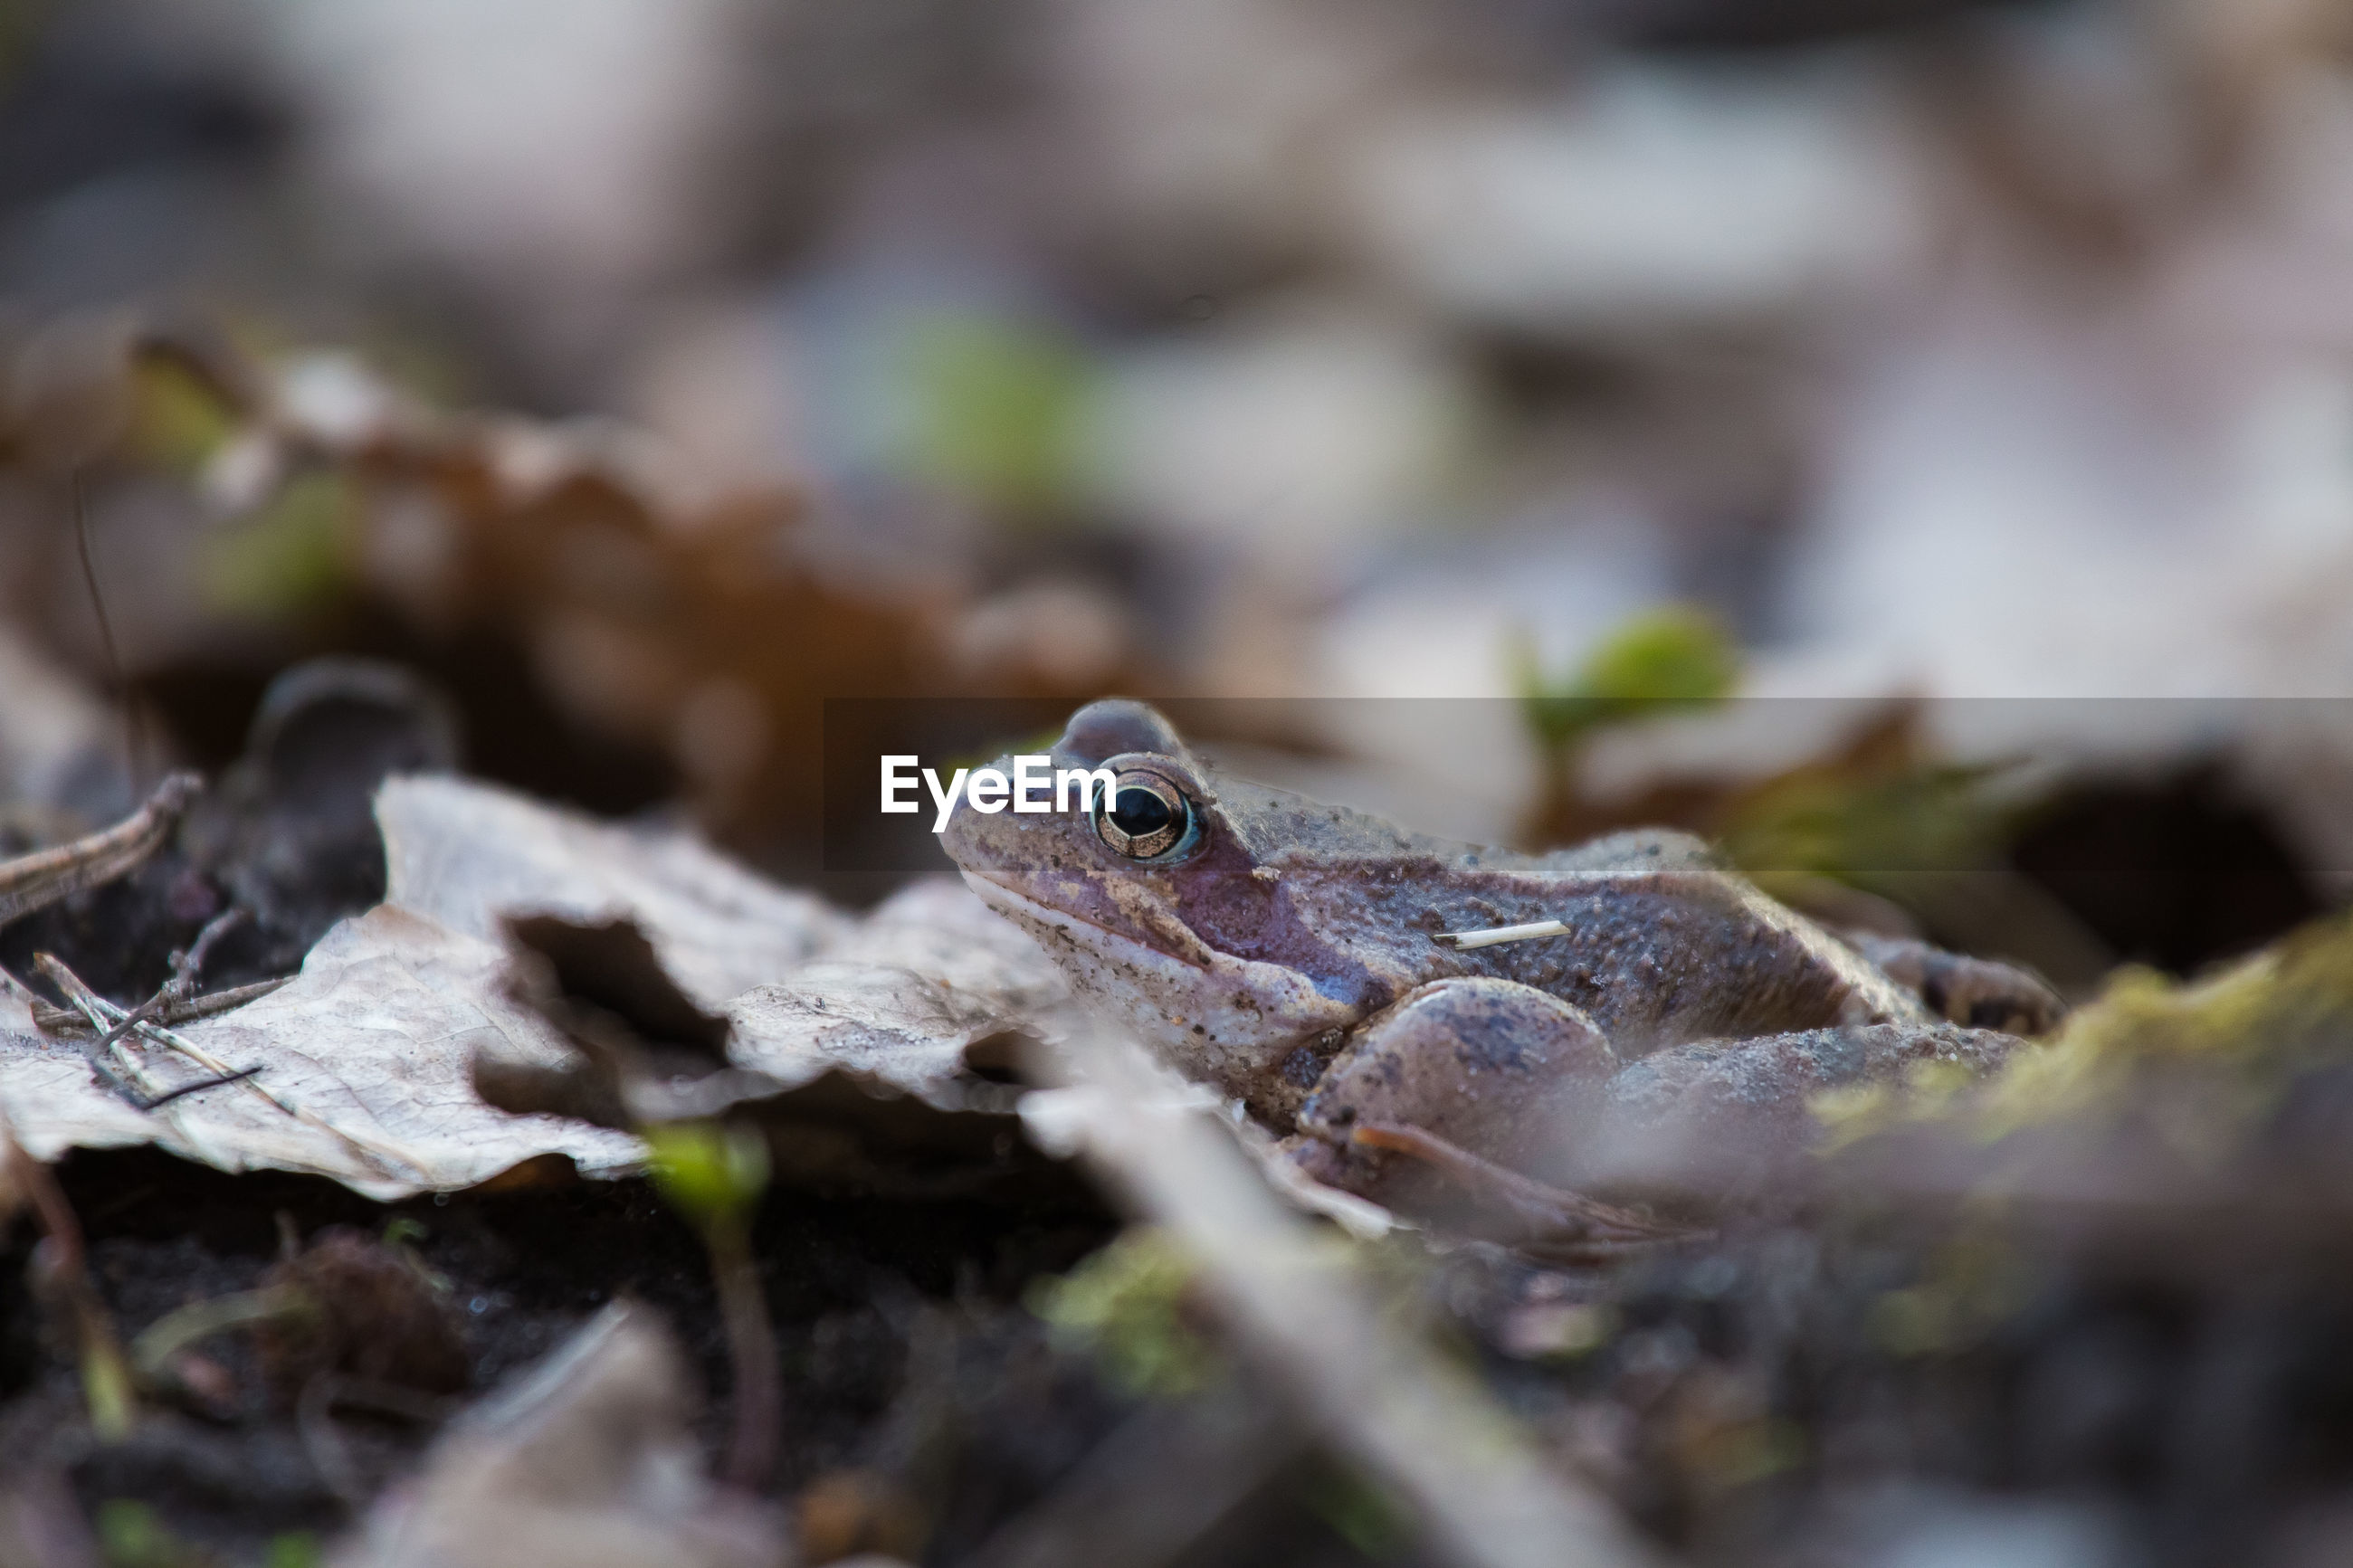 Frog on plants